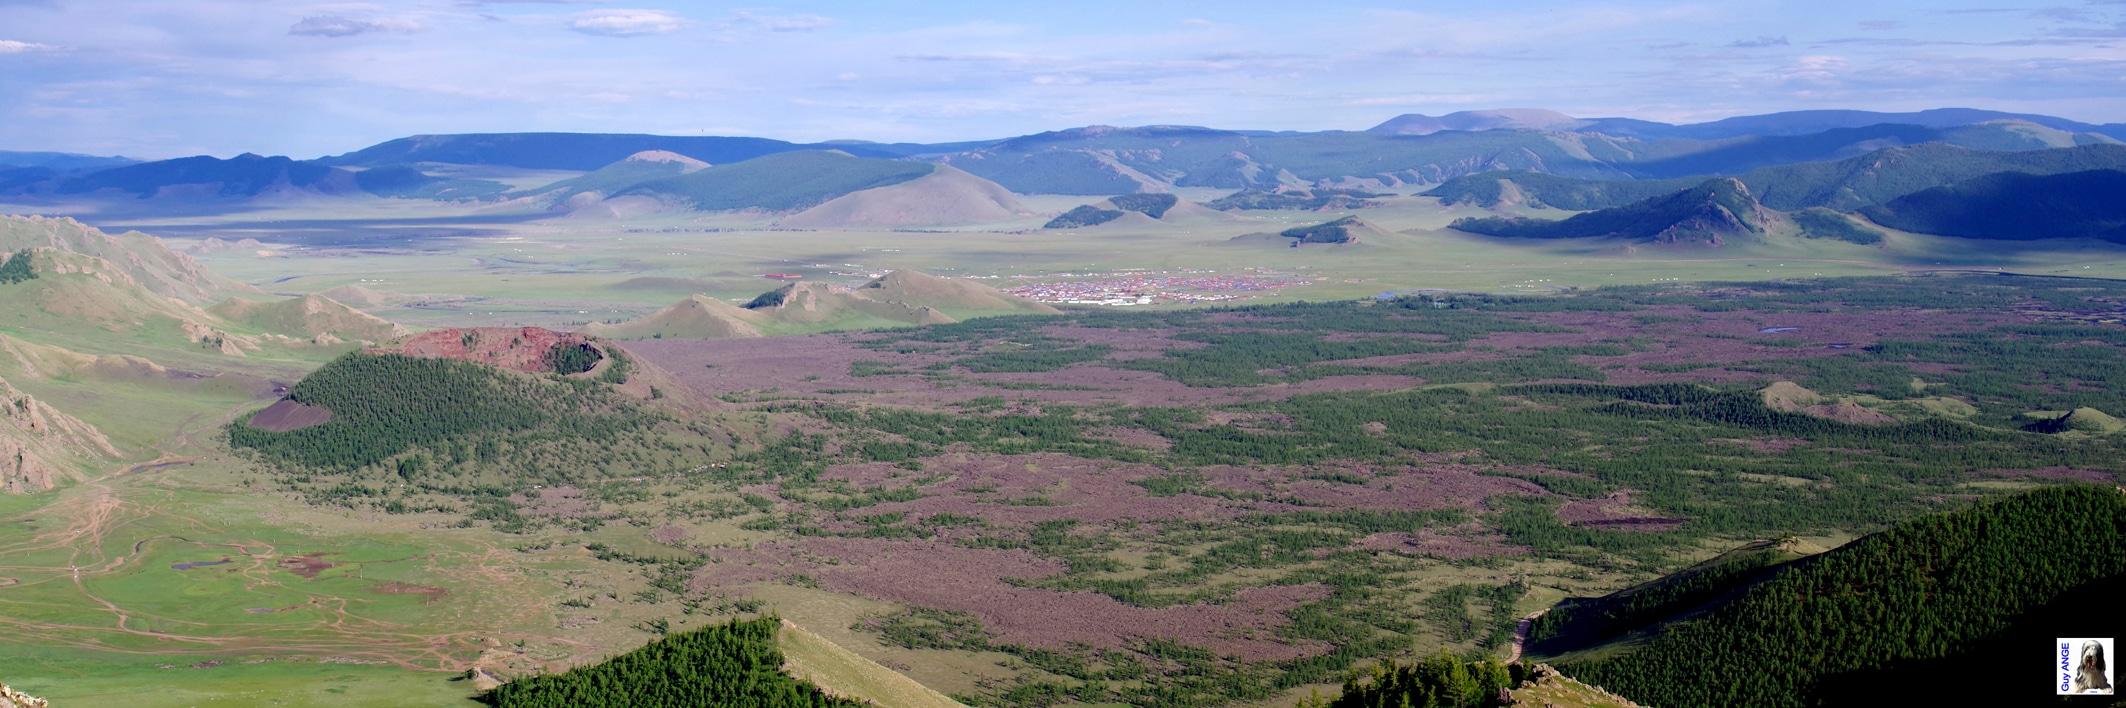 Parc Naturel de Terkhiin Tsagaan Nuur. Volcan Khorgo.